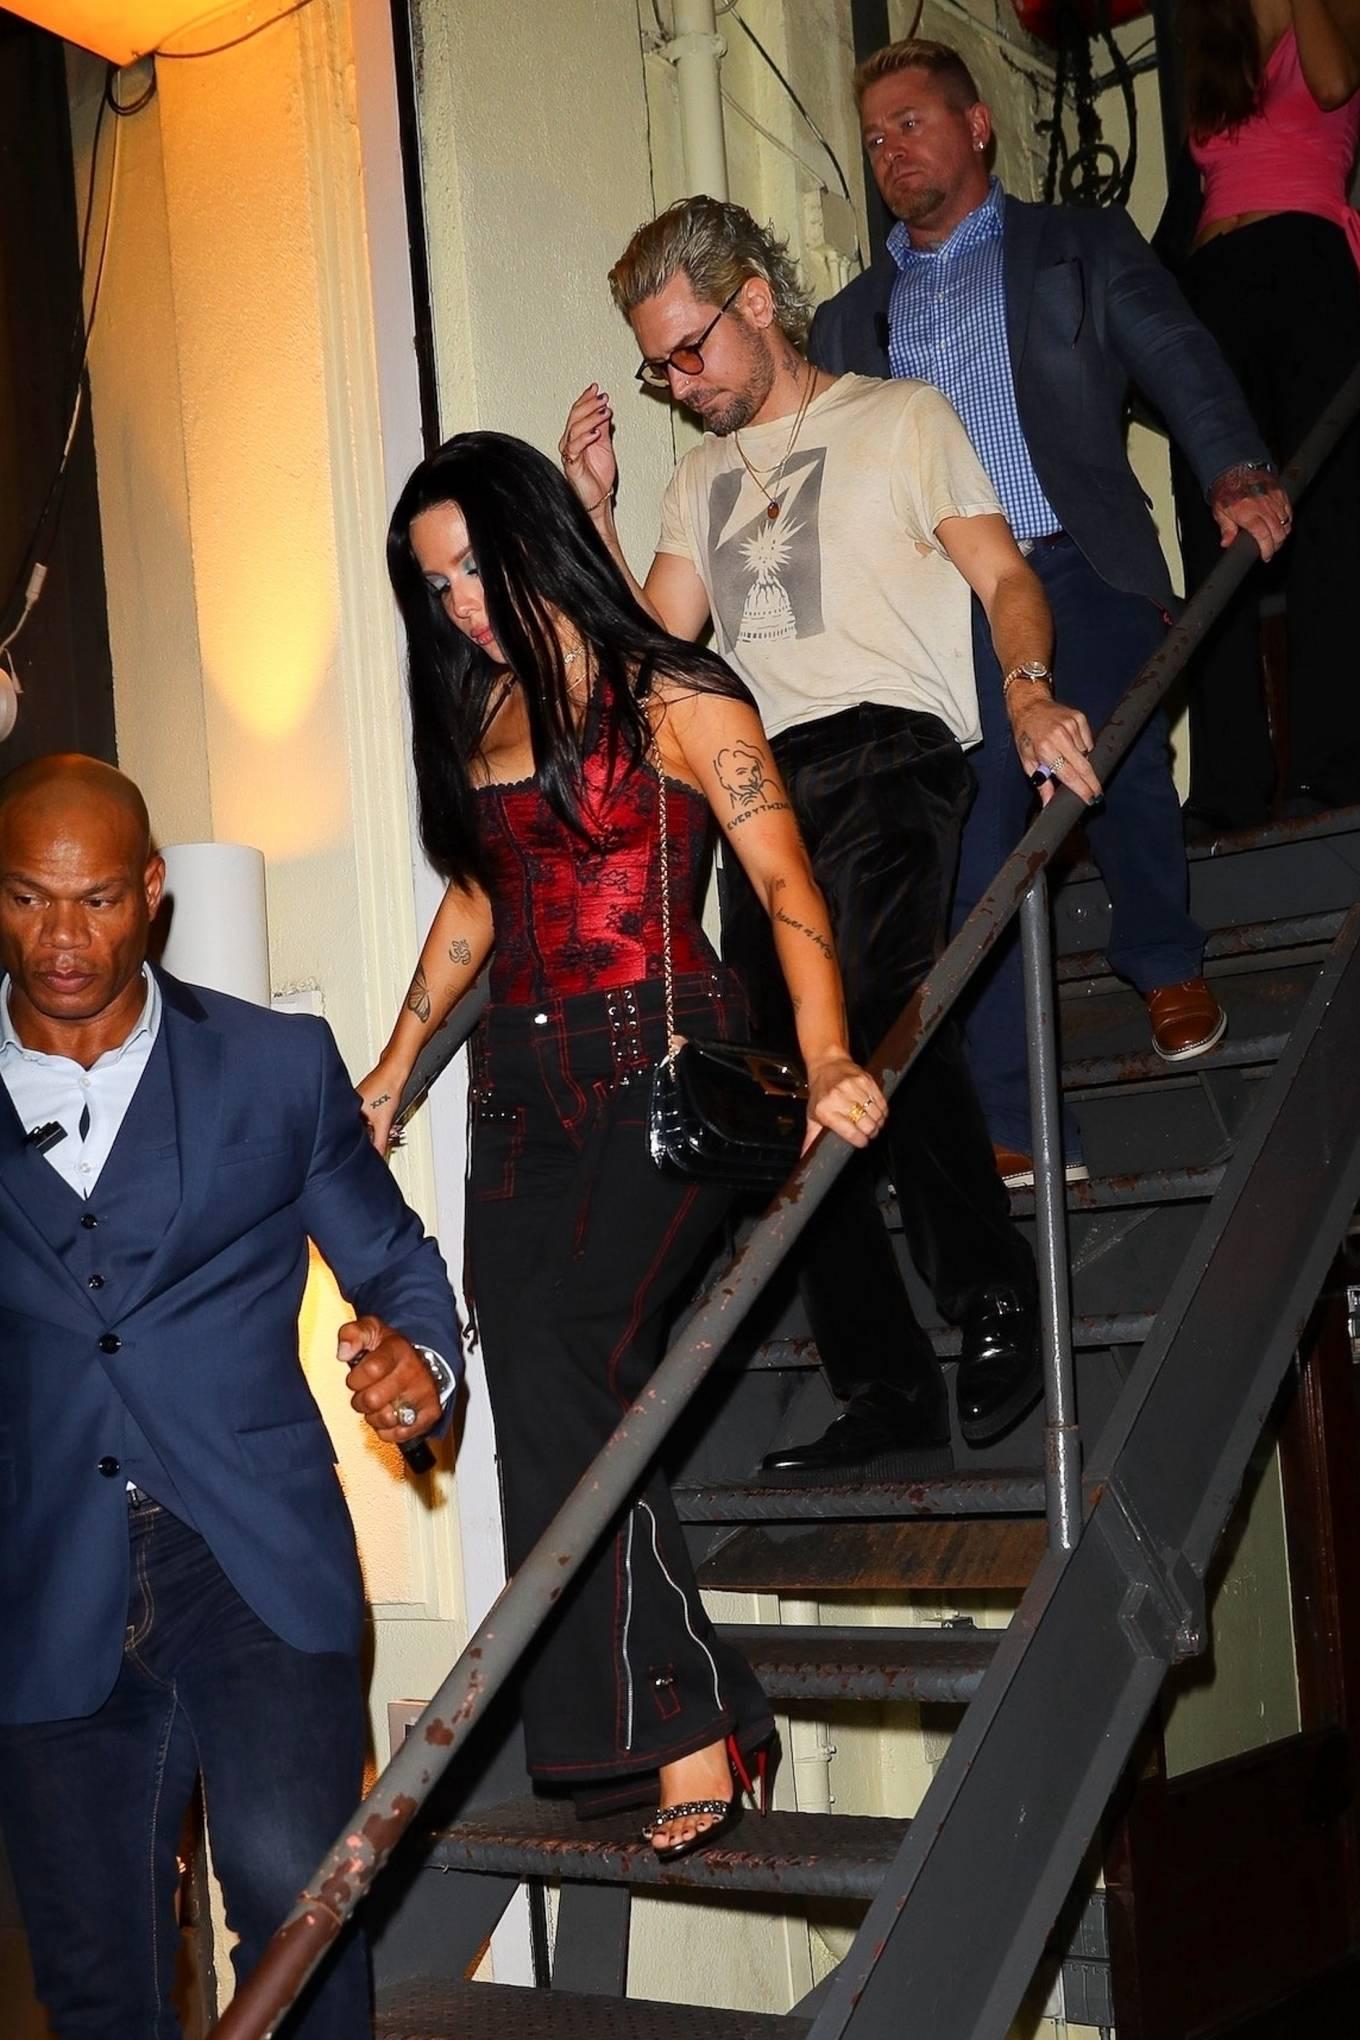 Halsey - With her boyfriend leave Bella Hadid's New York Fashion Week event